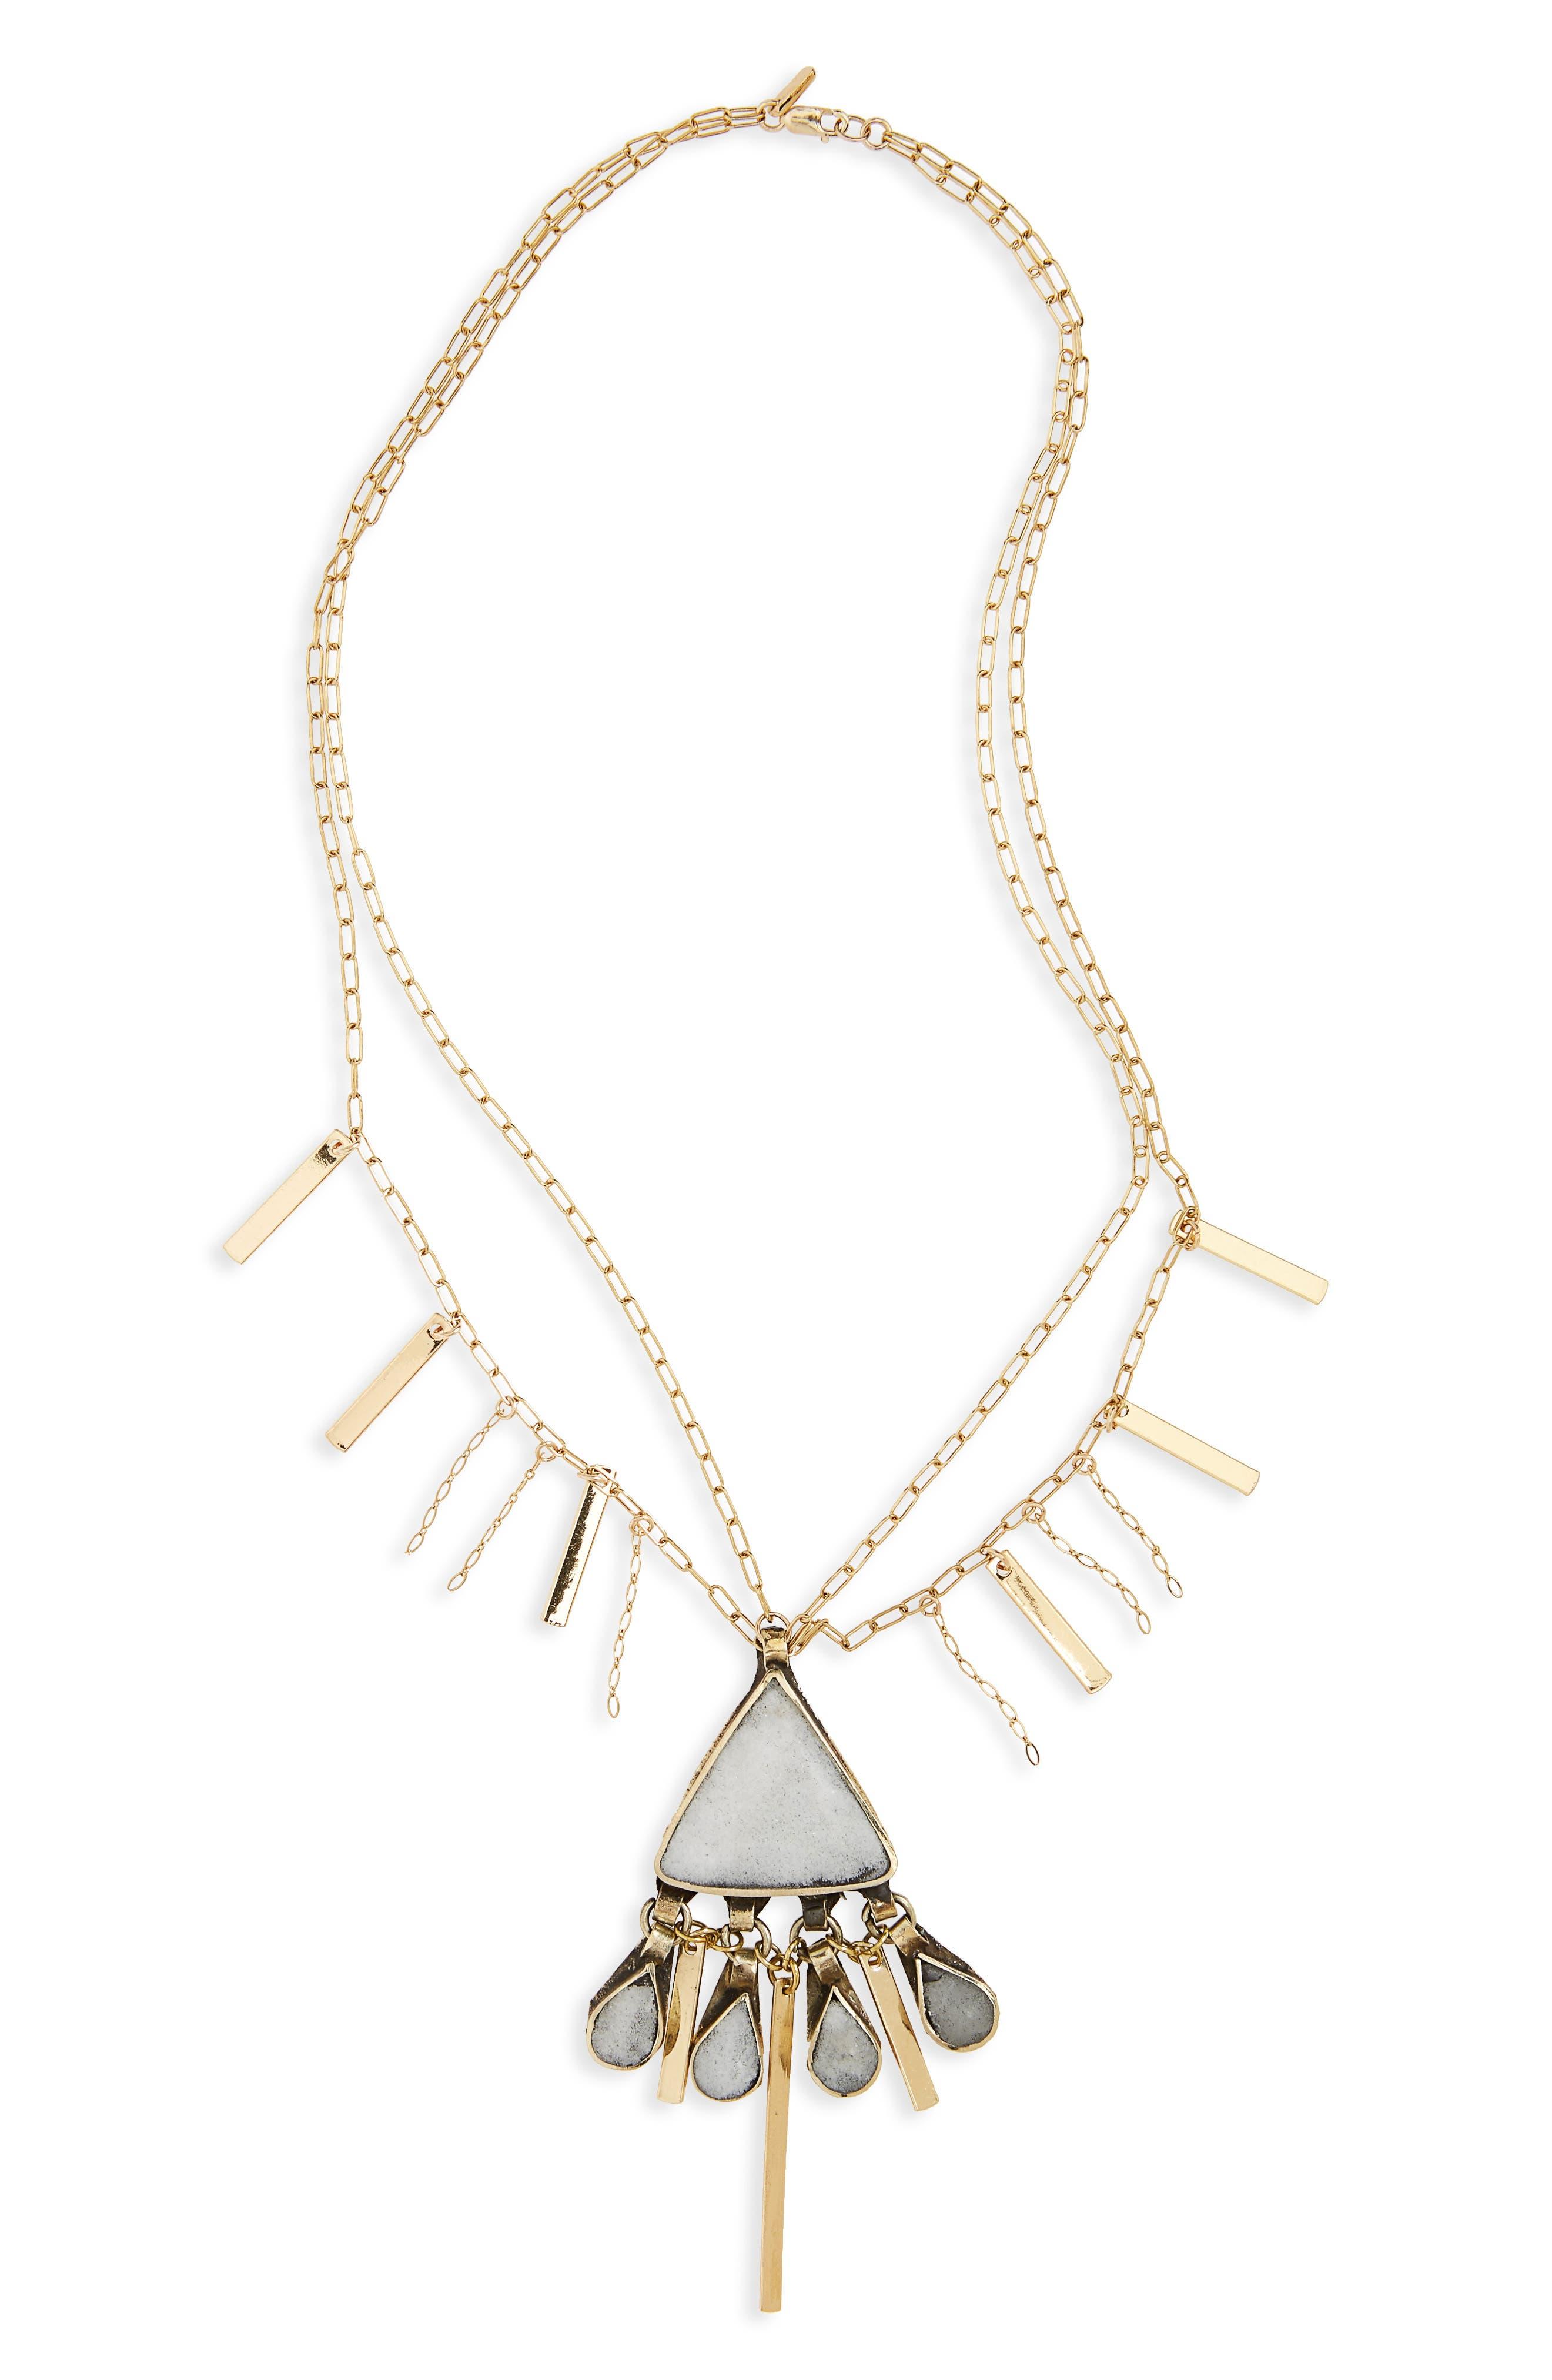 Main Image - Vanessa Mooney Gia Pendant Necklace